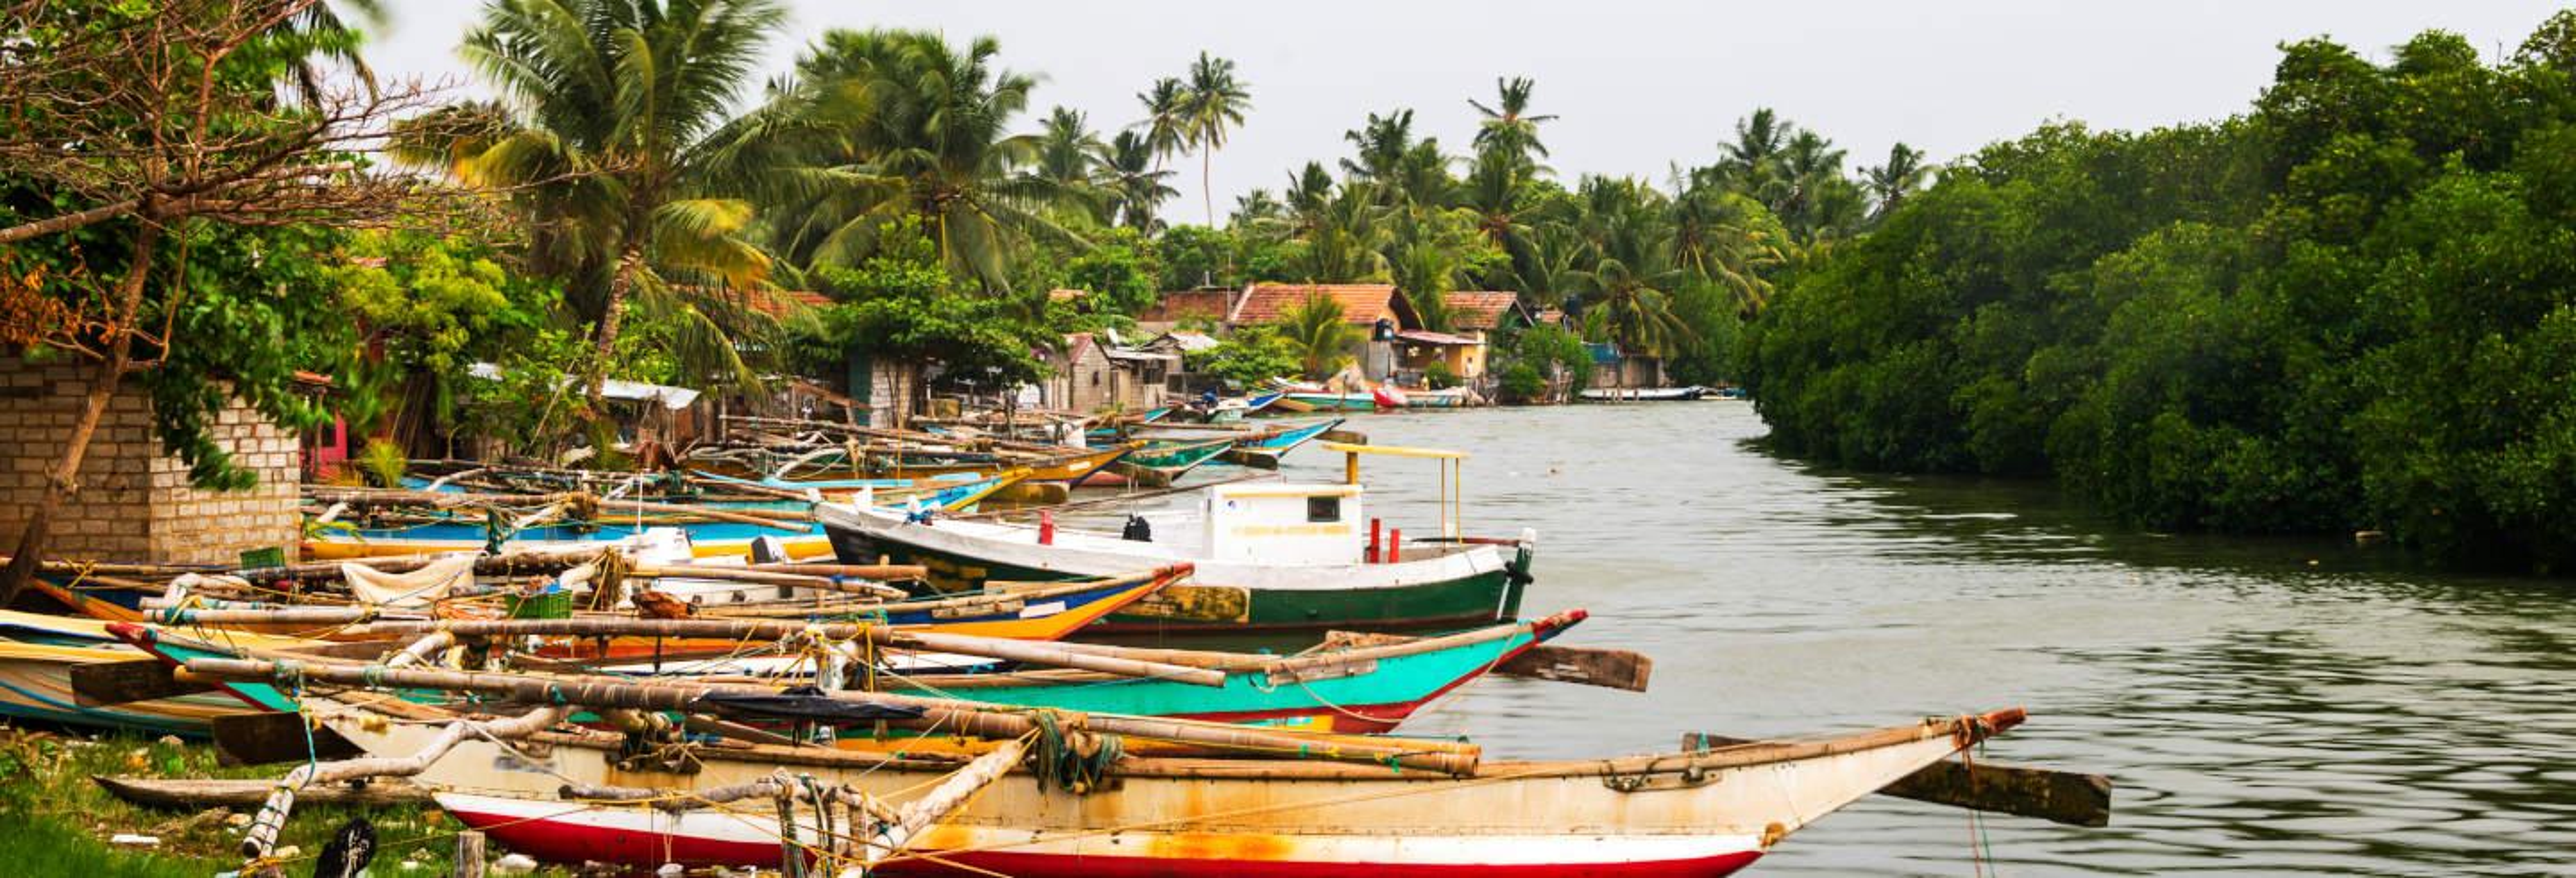 Excursão a Negombo